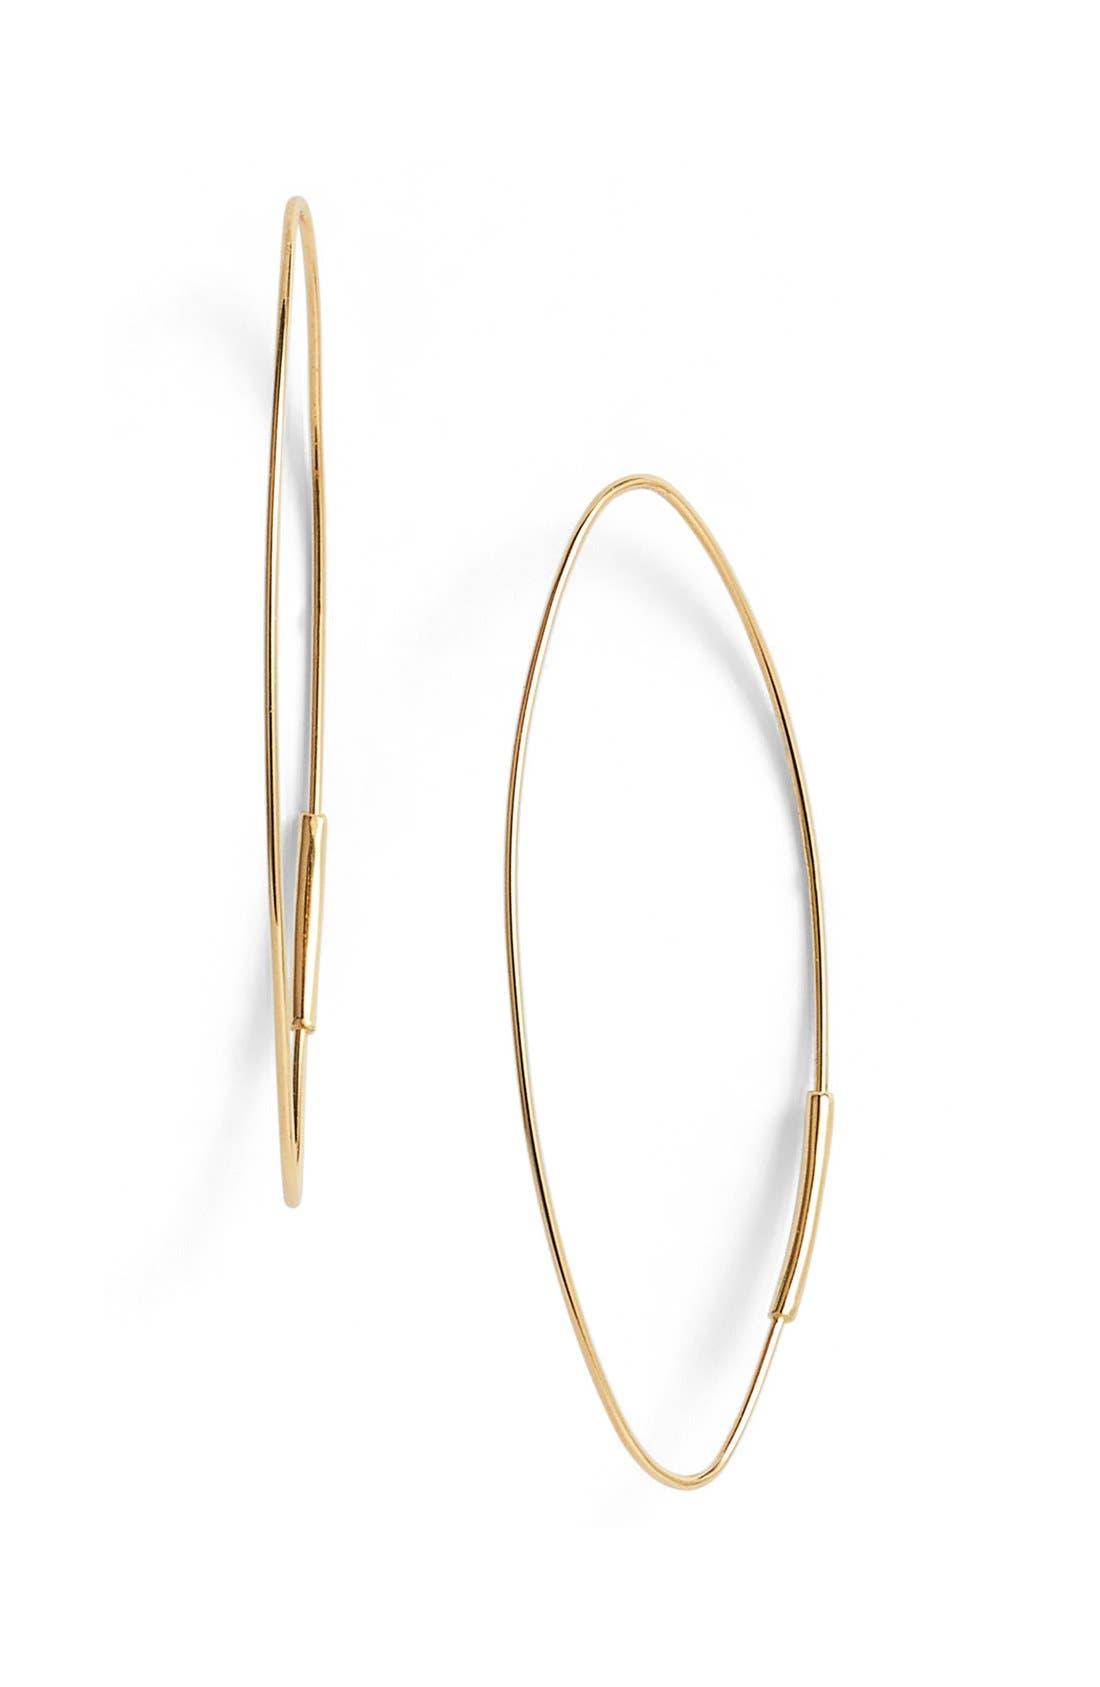 Main Image - Lana Jewelry 'Magic' Small Oval Hoop Earrings